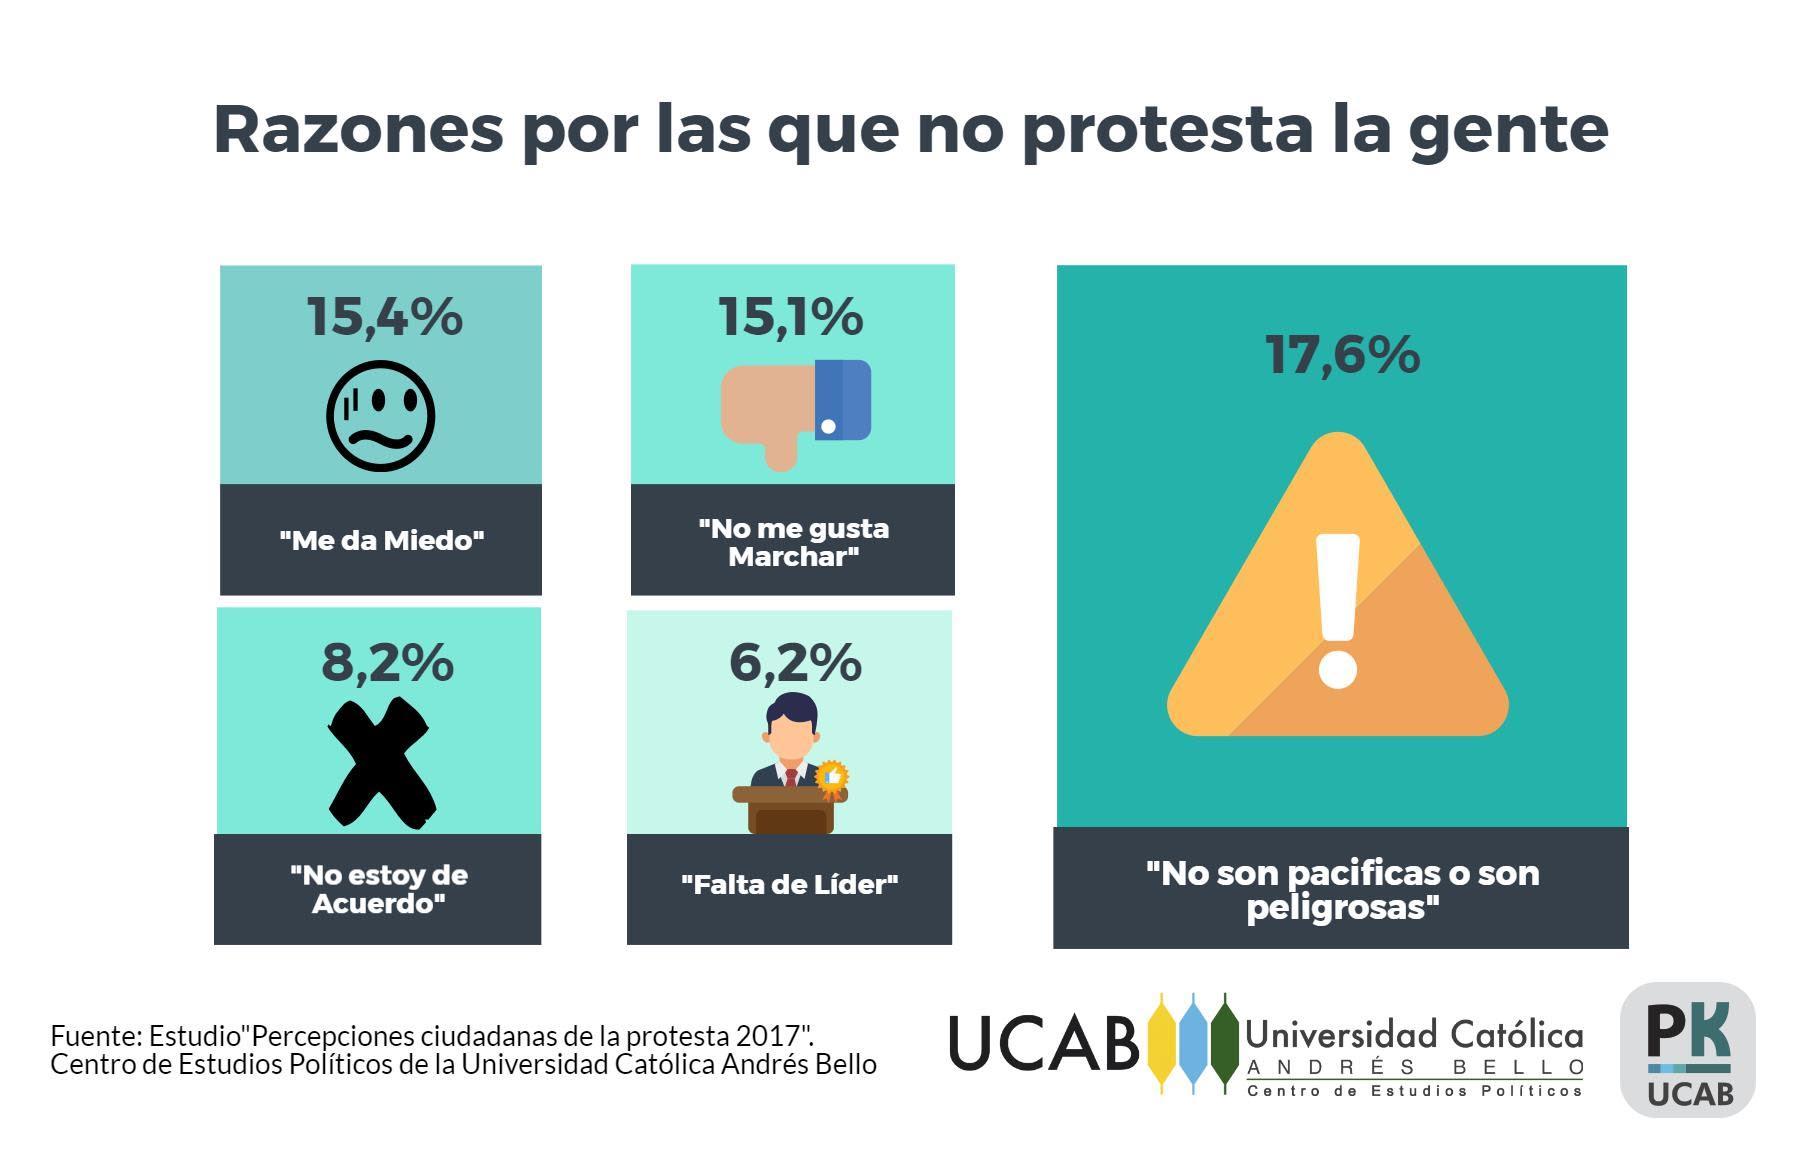 RazonesdeProtestar